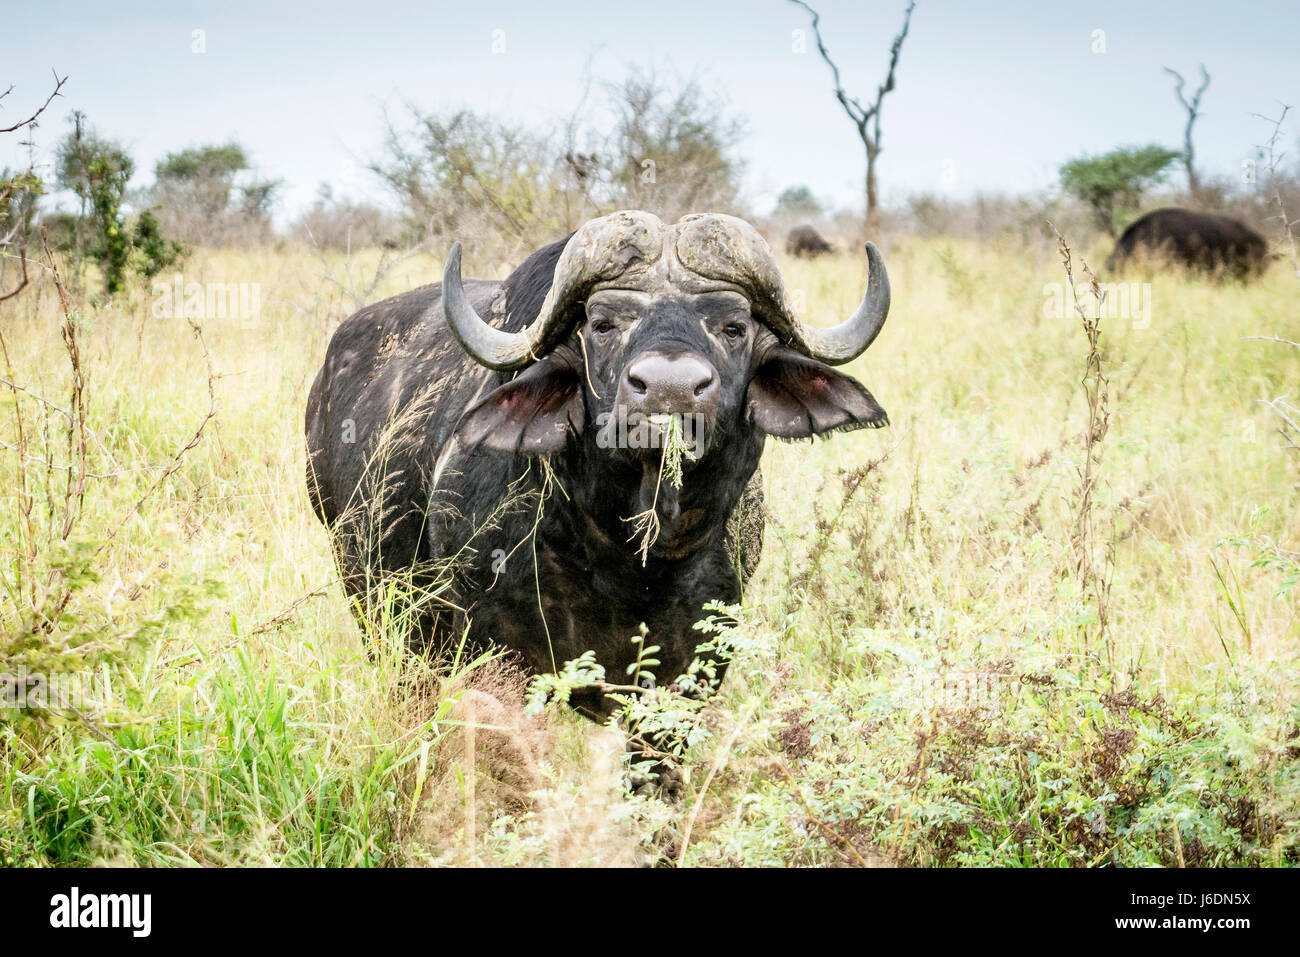 Afrikanischer Büffel Weiden mit Grass im Maul in Krüger Nationalpark, Südafrika Stockbild